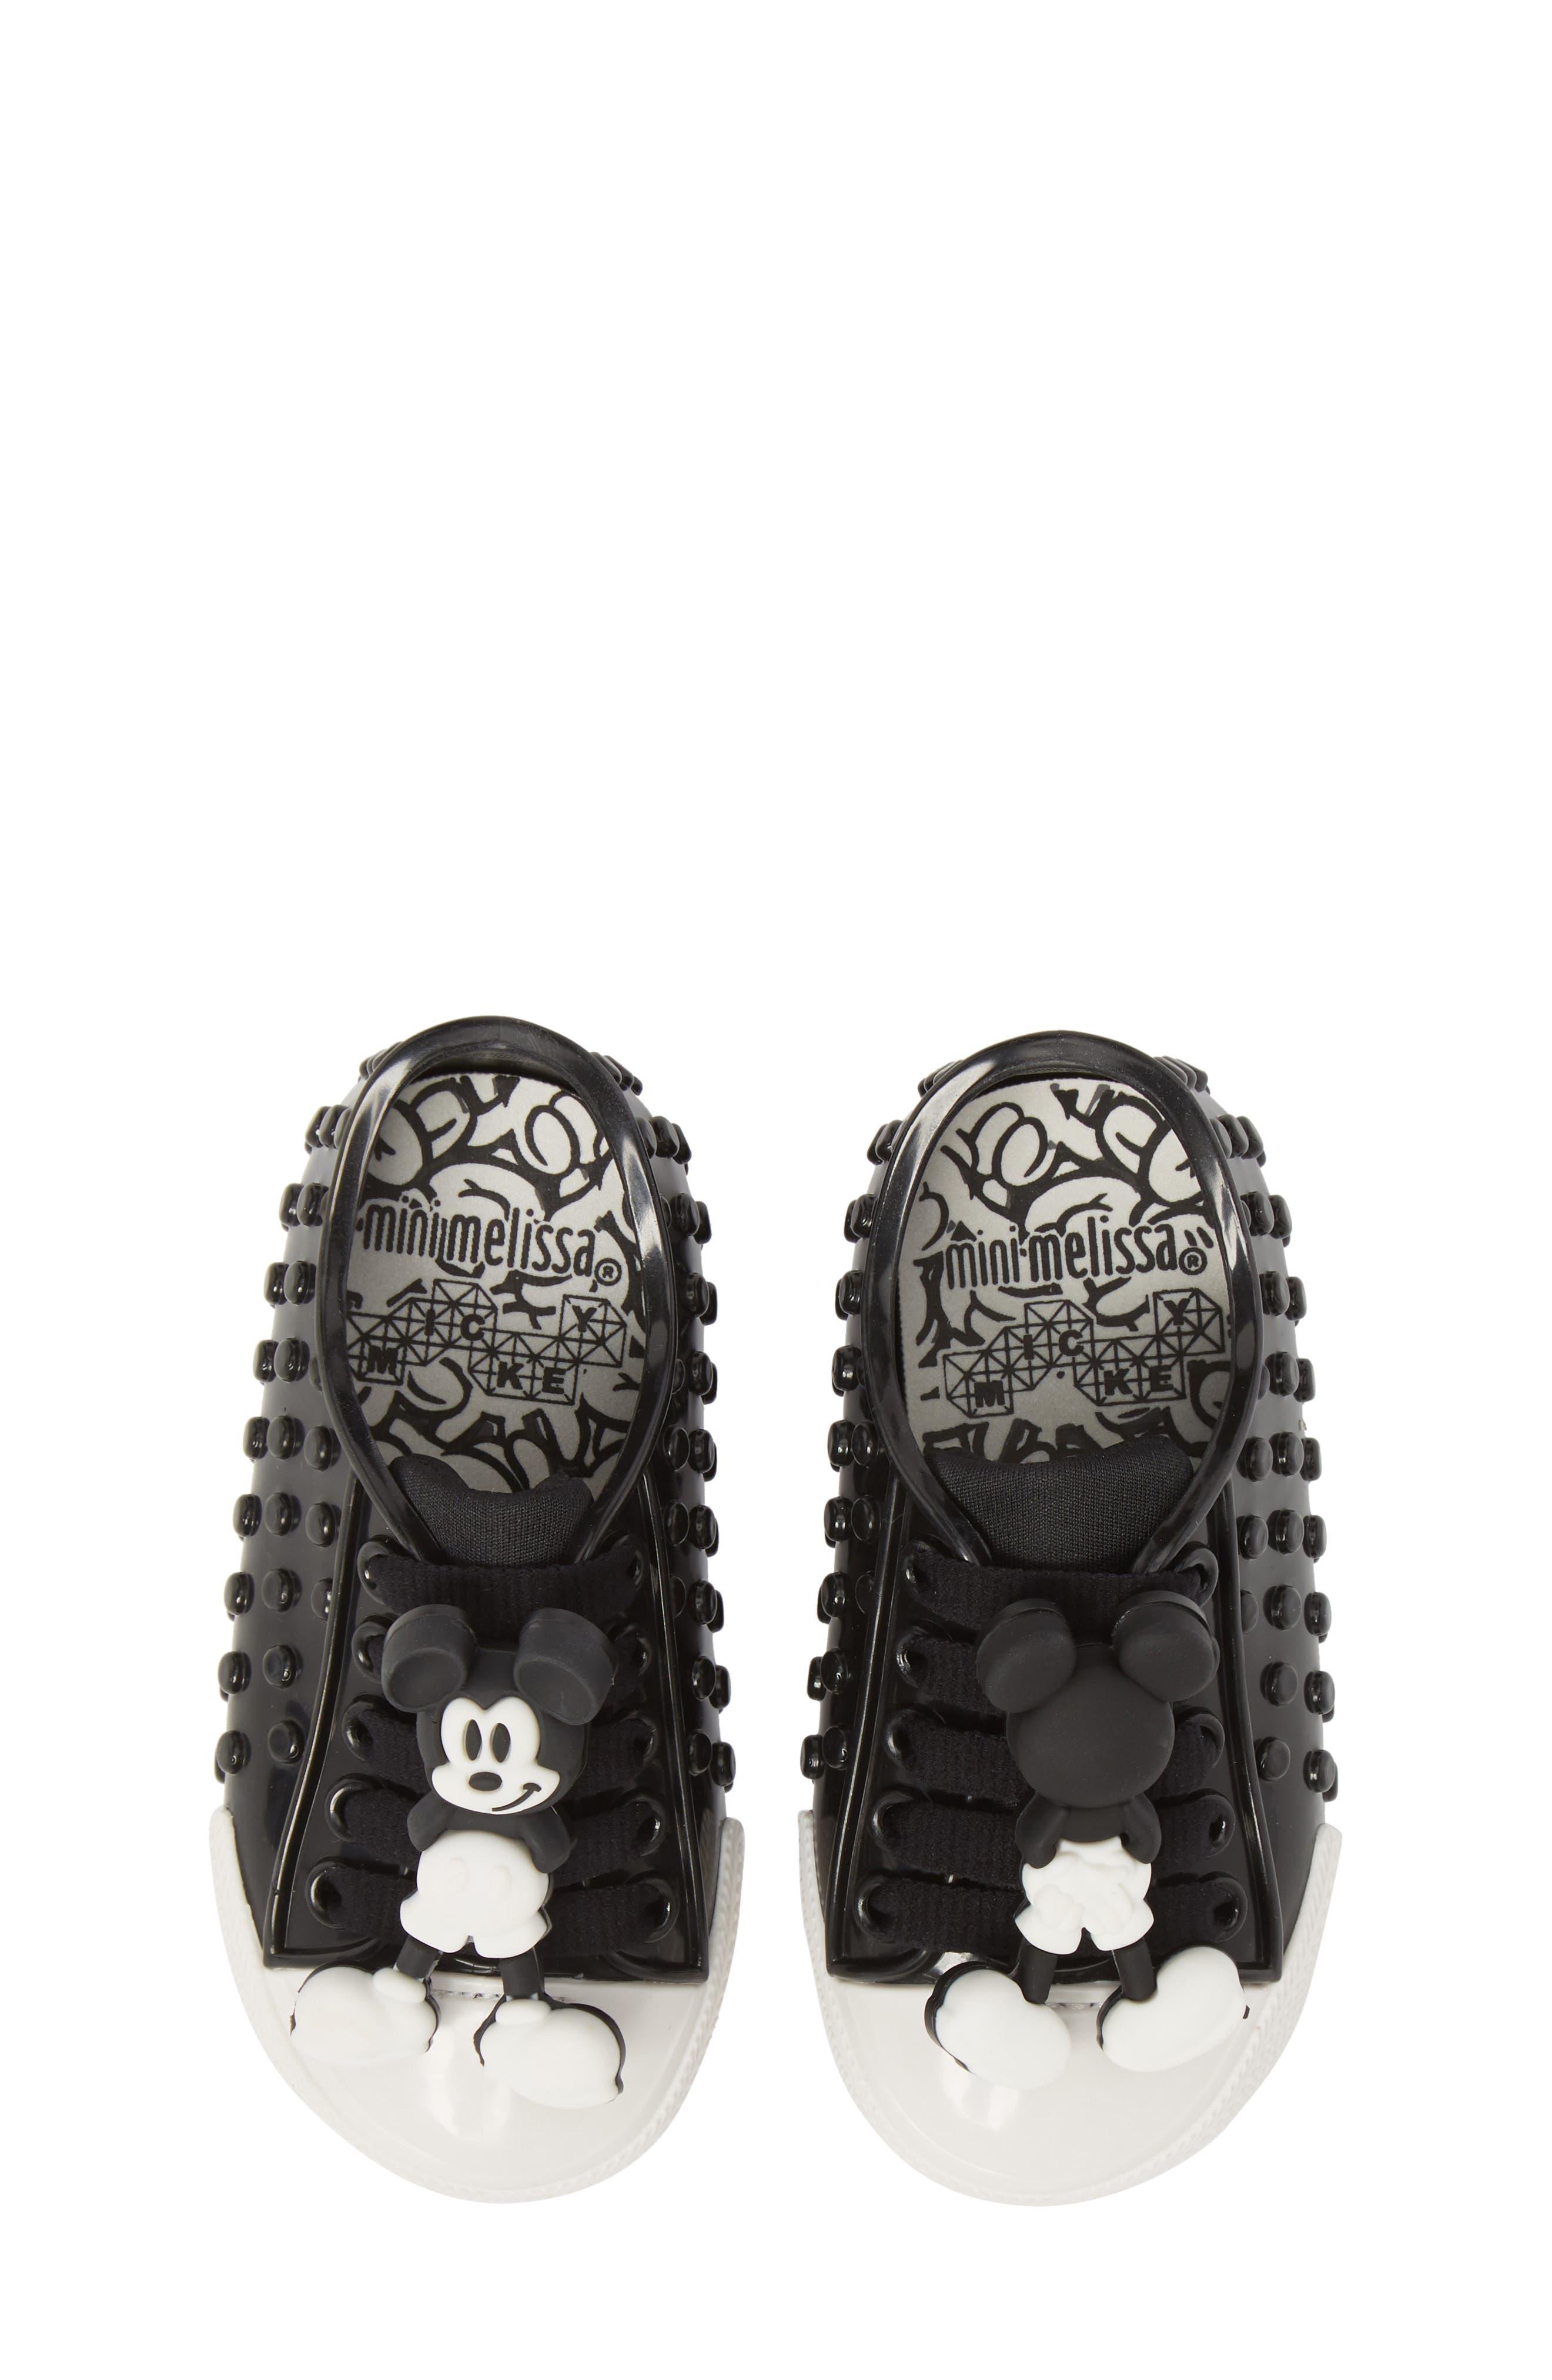 Polibolha Disney's Mickey Mouse<sup>®</sup> Sneaker,                             Main thumbnail 1, color,                             001